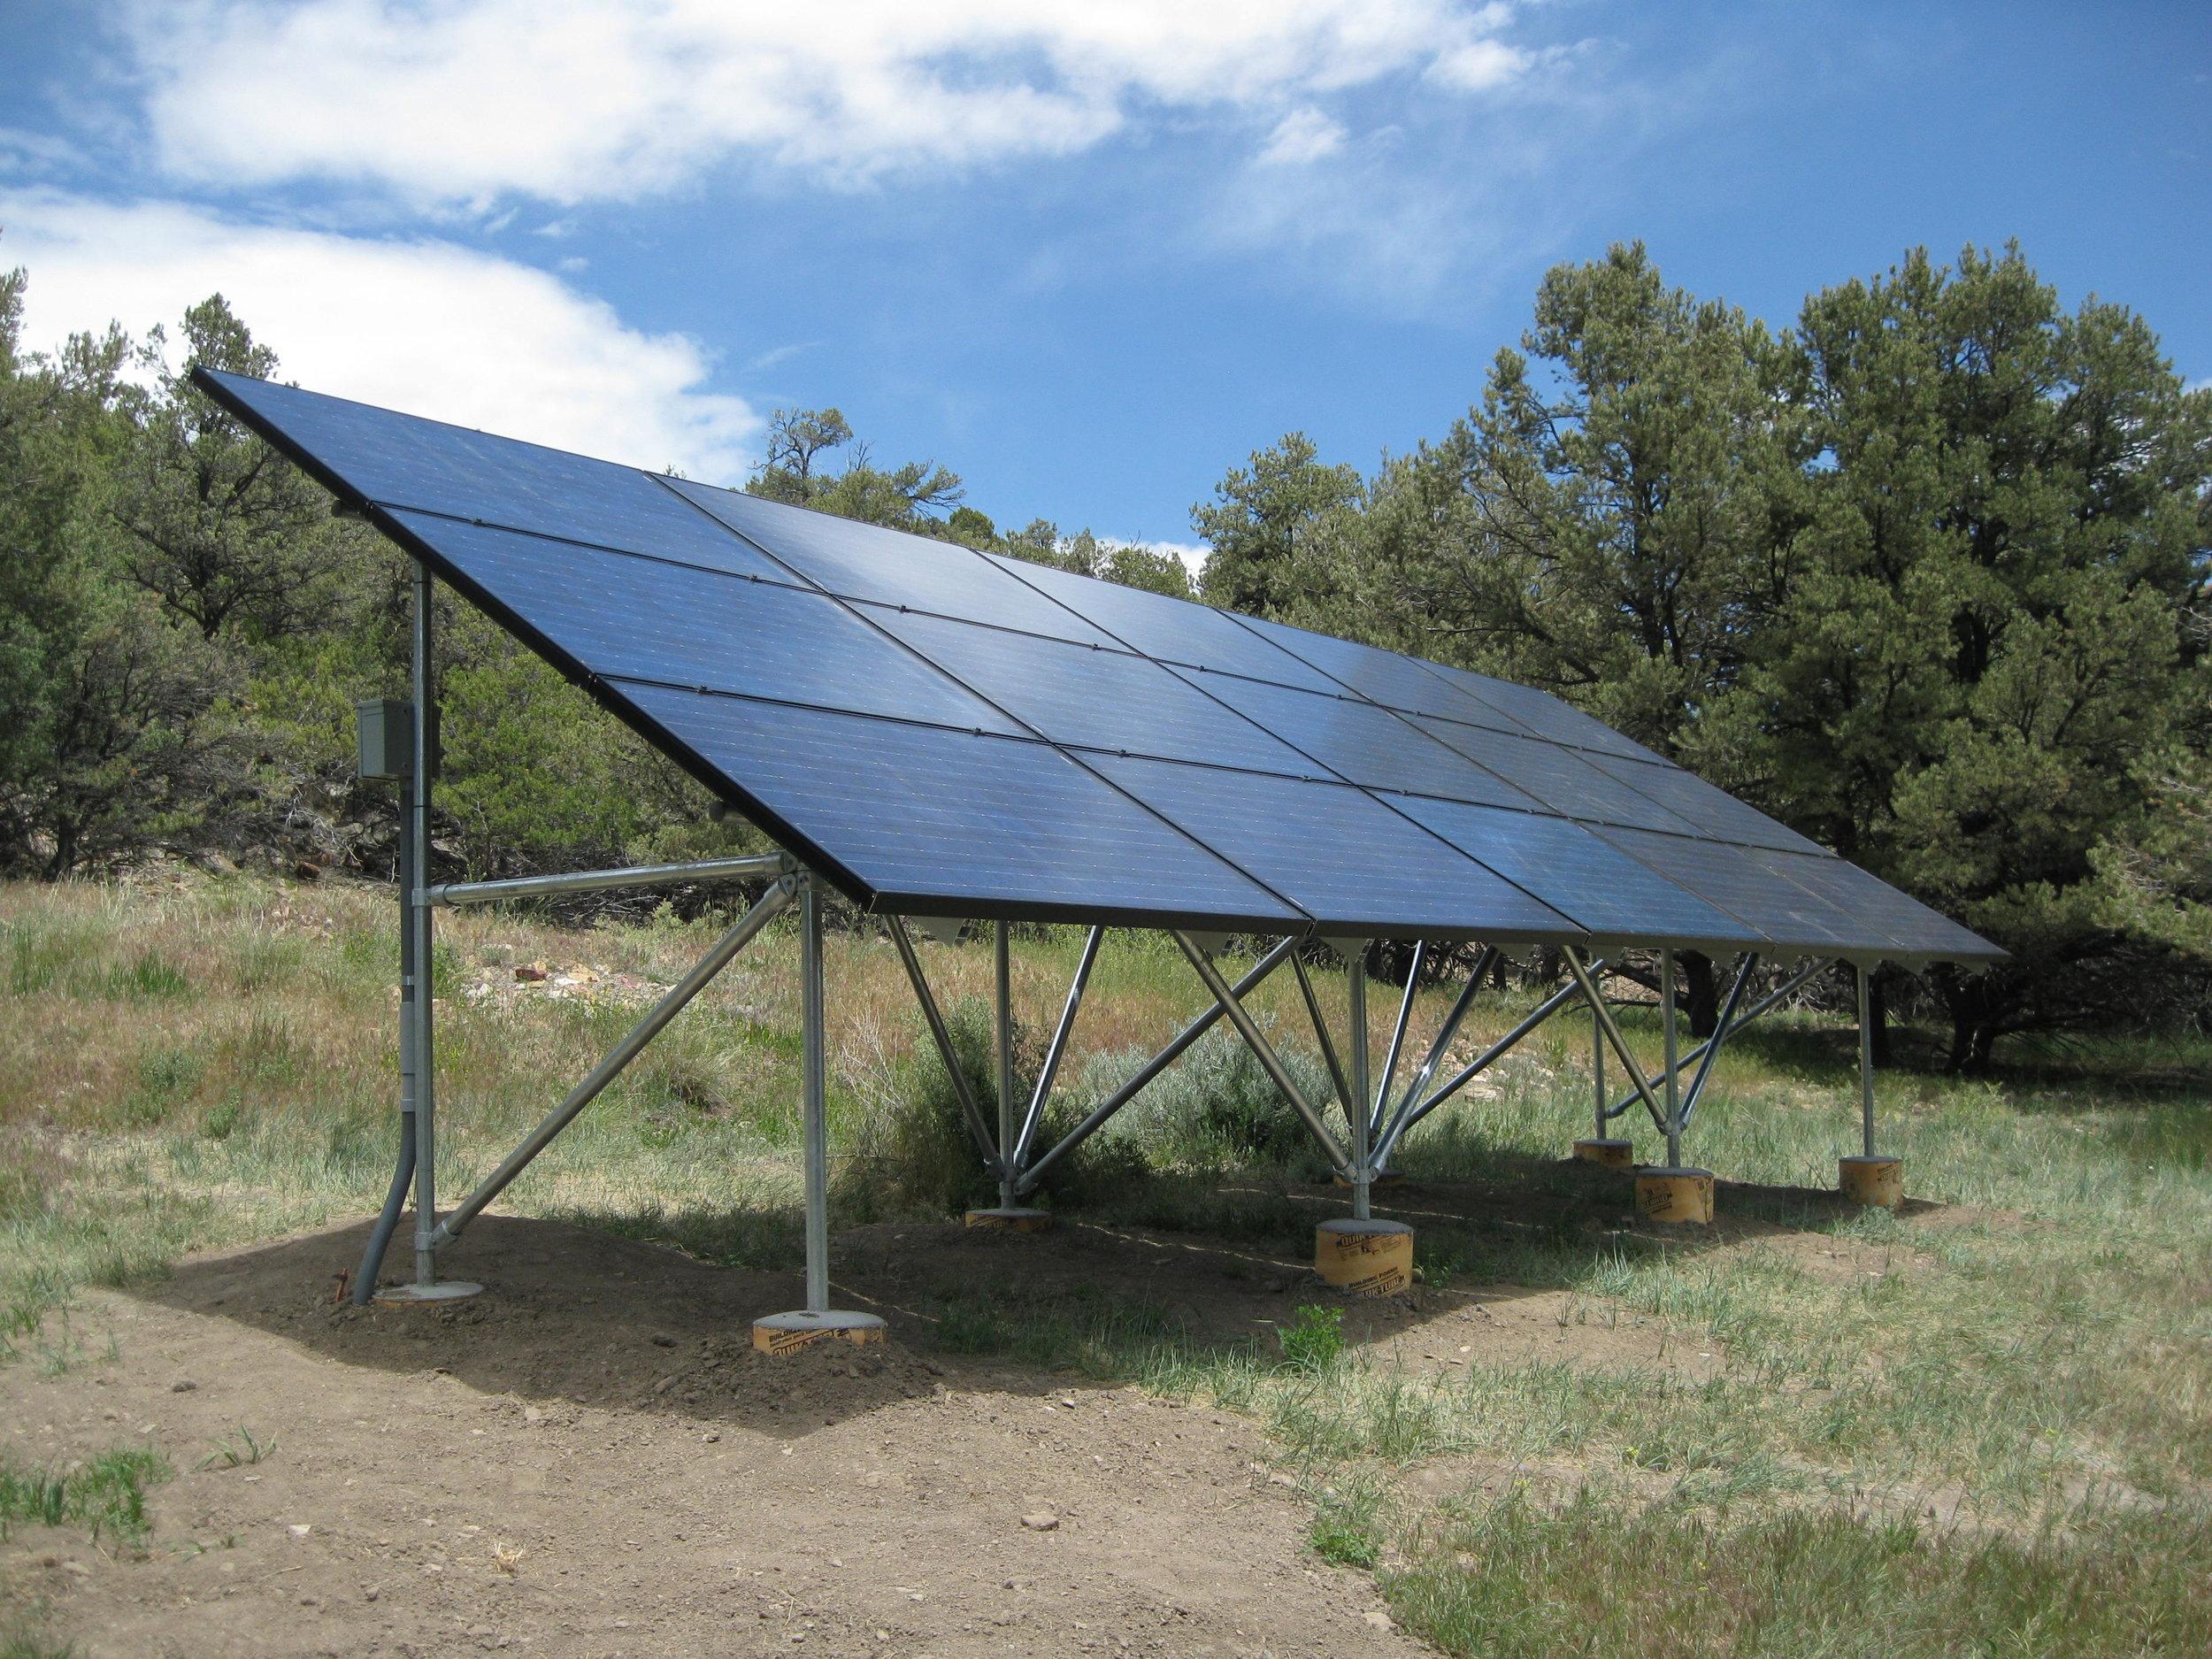 alternative-power-enterprises-solar-installation-projects10.jpg